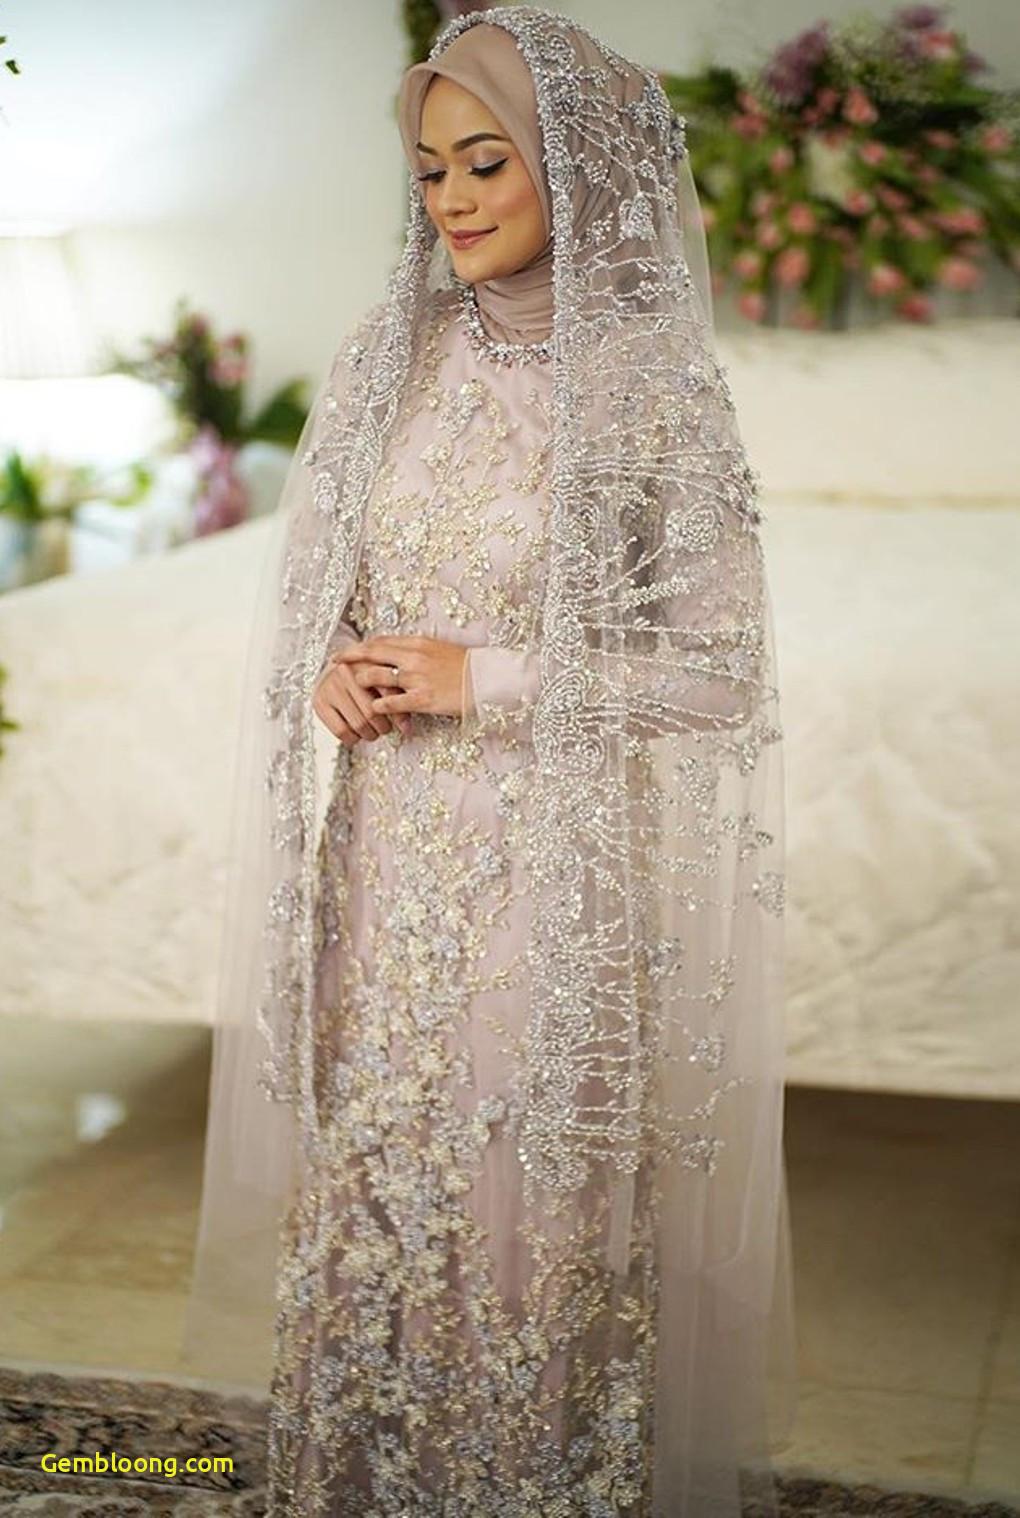 Gaun Sederhana Pengantin Berhijab Best Of 20 Inspirasi Gaun Pernikahan Untuk Calon Pengantin Berhijab